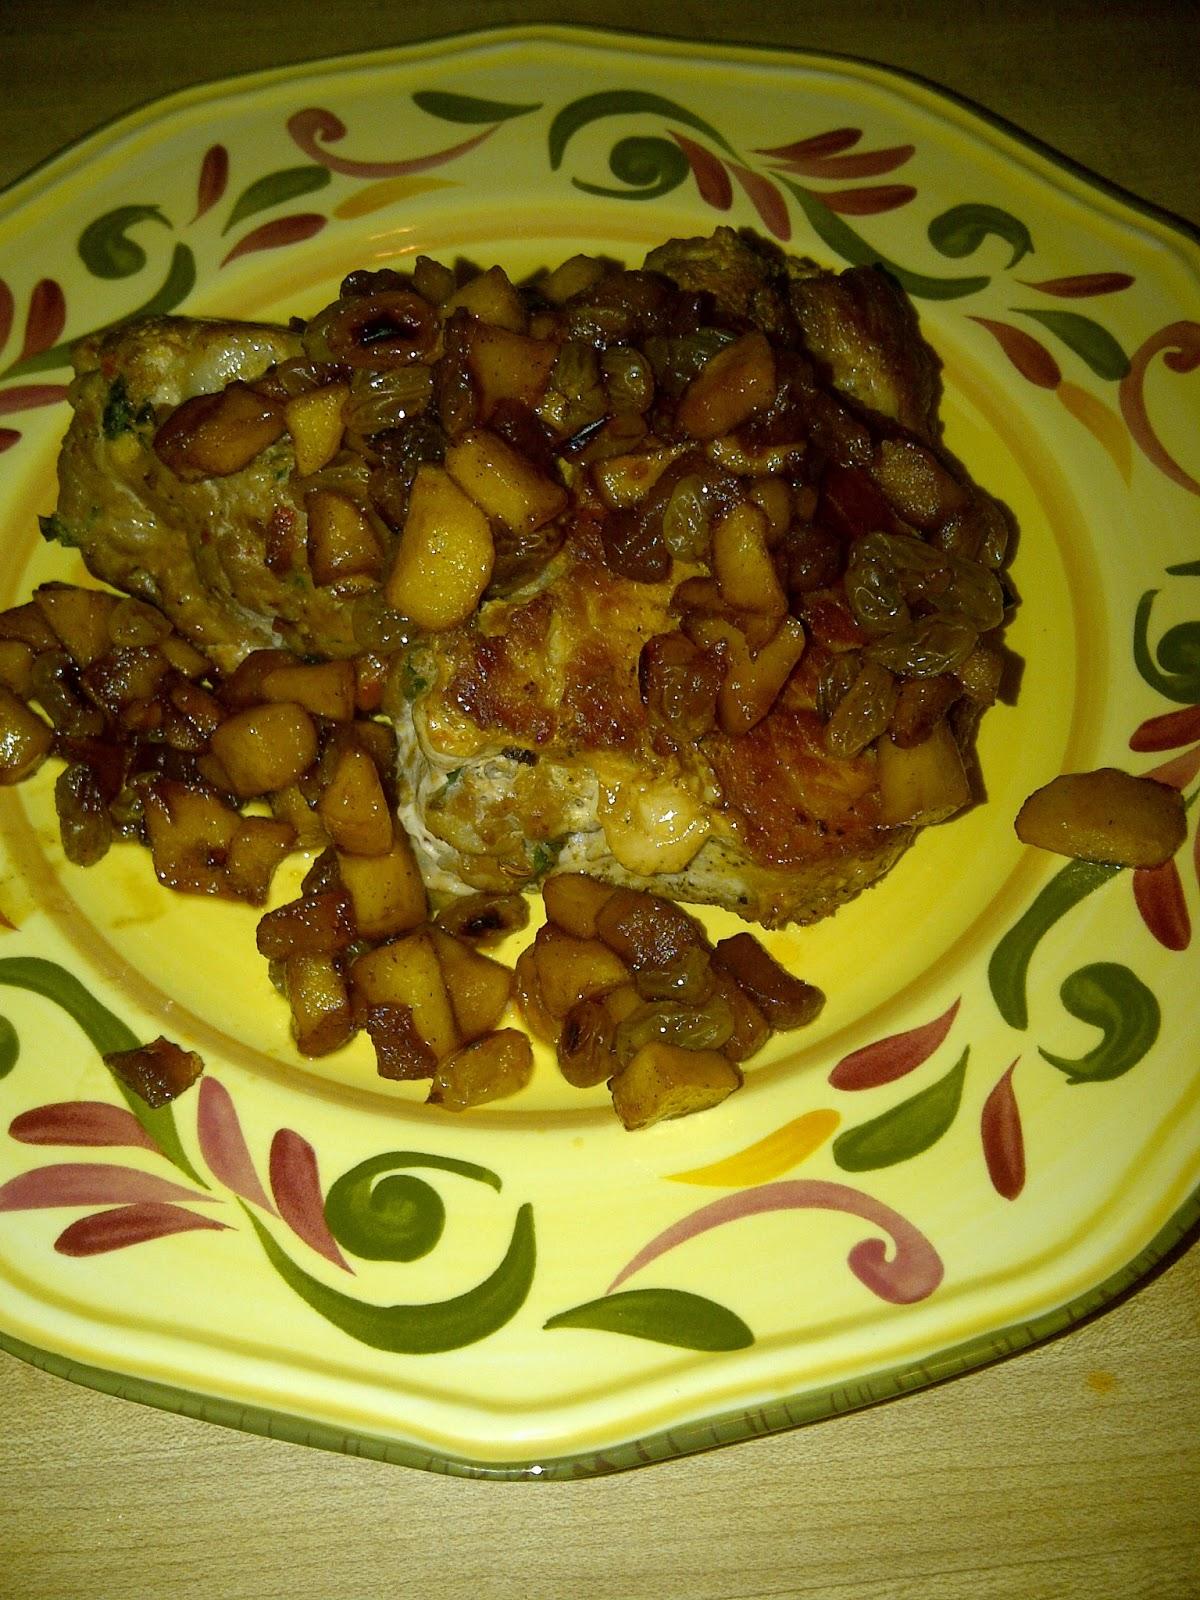 Stuffingtopped Pork Chops Inhouse Cook Stuffed Pork Chop With Sausage  Recipe